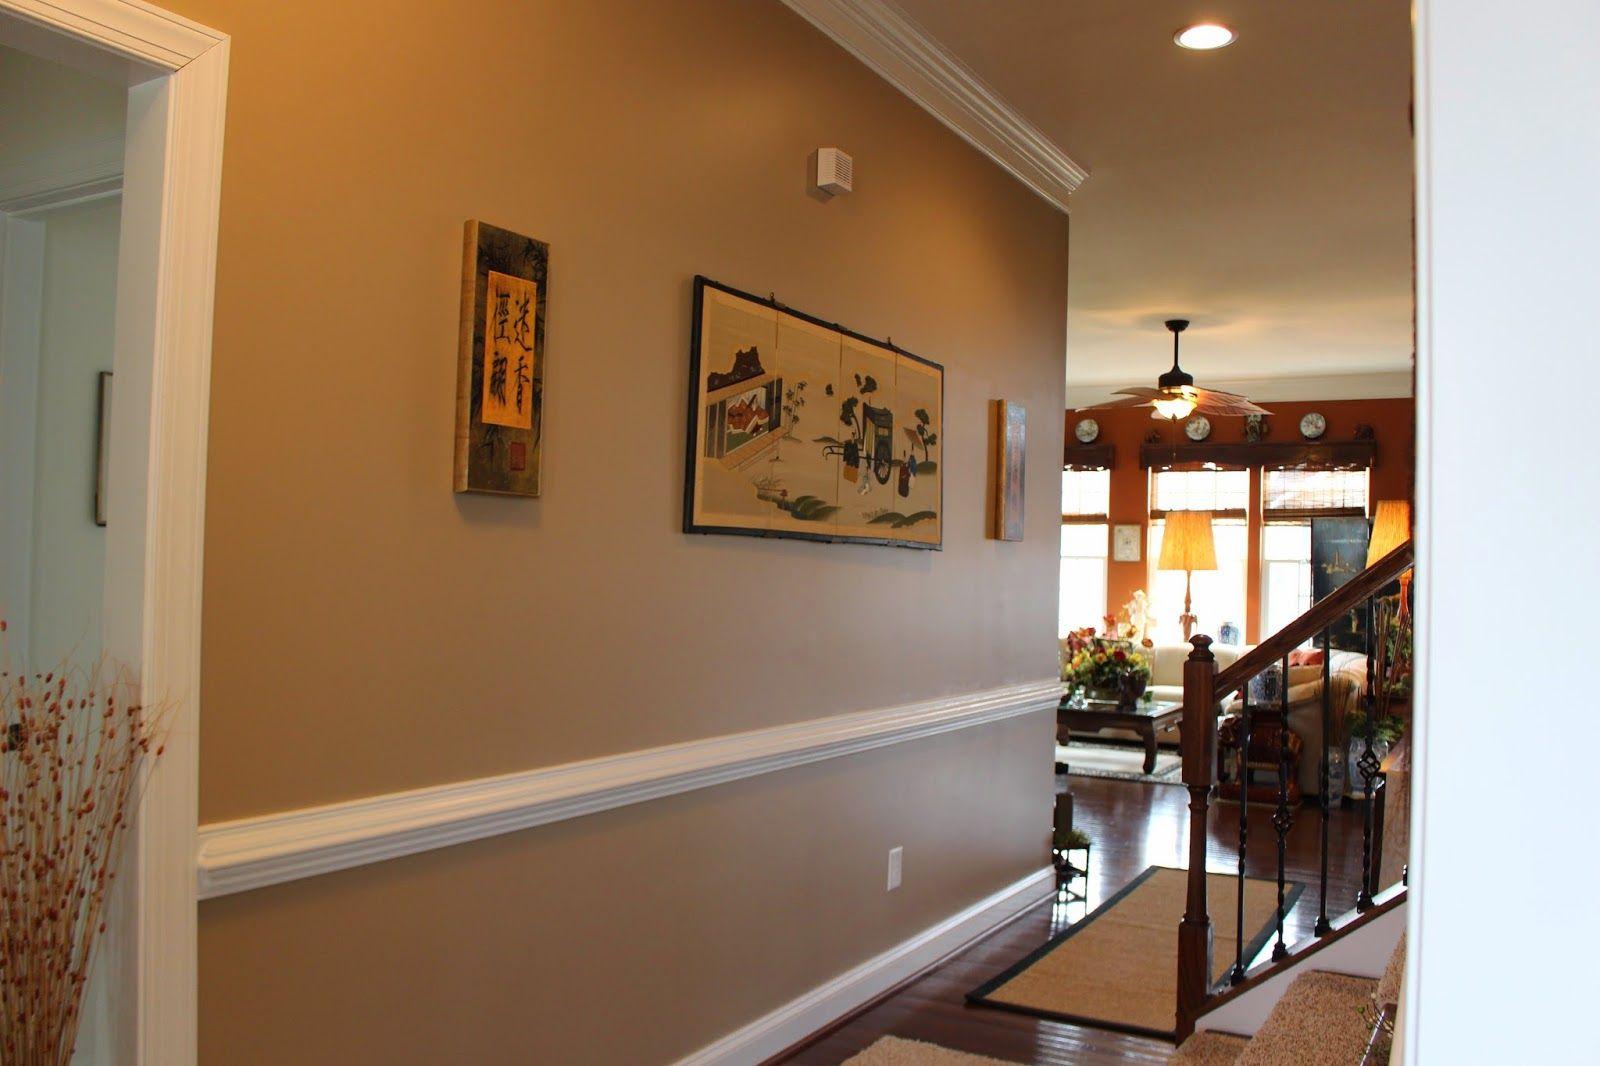 valspar faint maple interior house colors living room on valspar paint colors interior id=78399